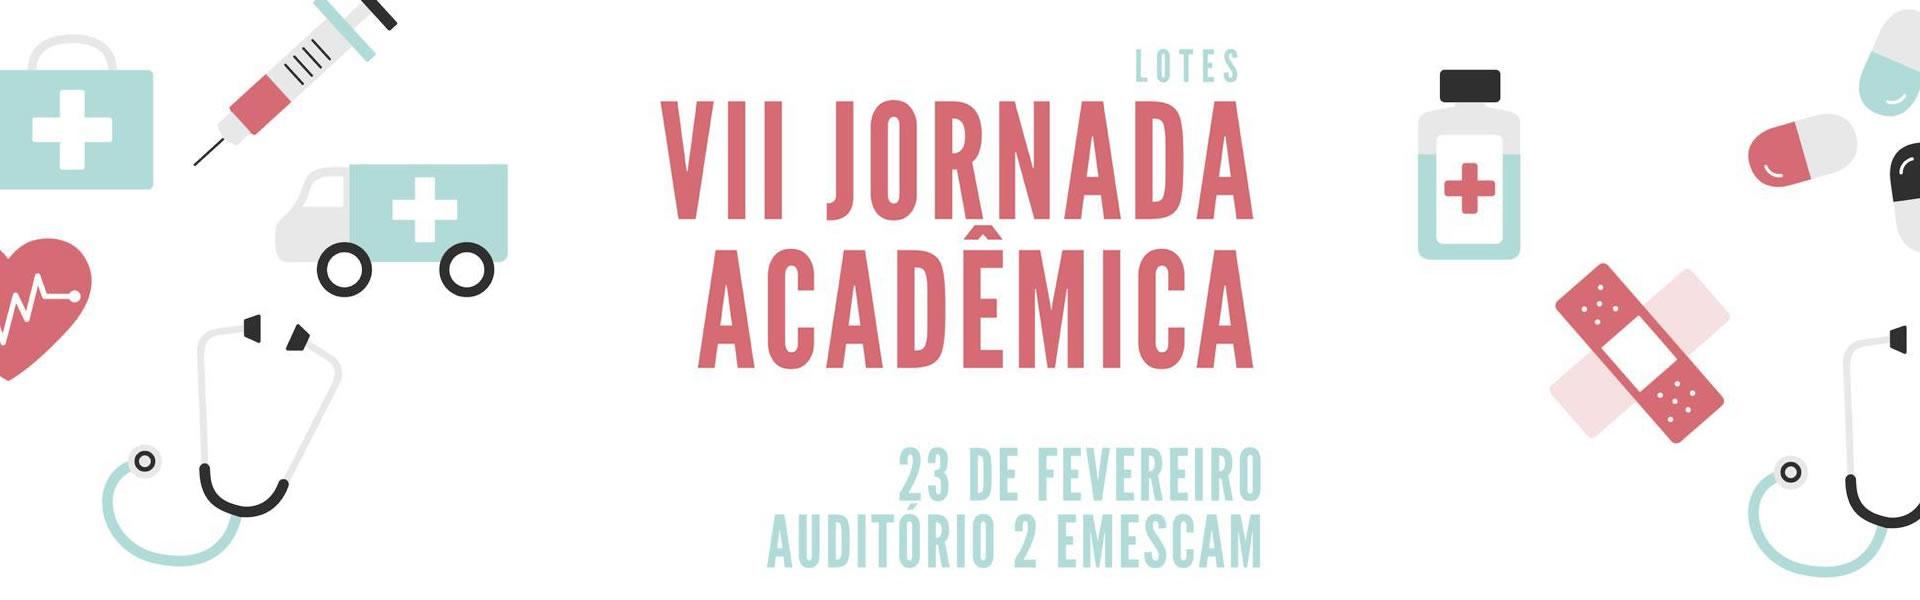 VII Jornada Lotes